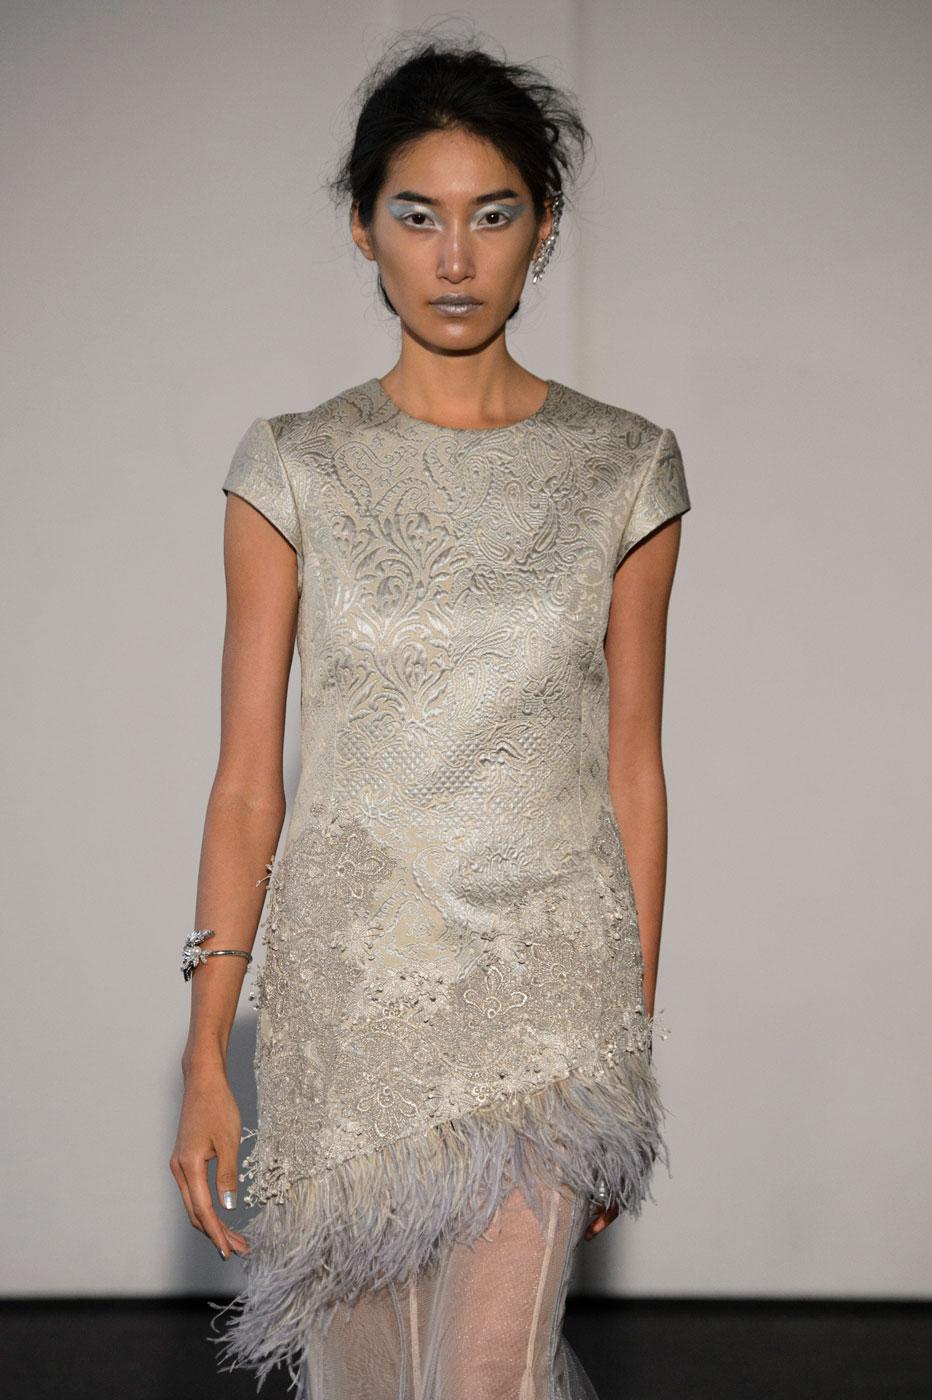 Busardi-fashion-runway-show-haute-couture-paris-spring-2015-the-impression-59